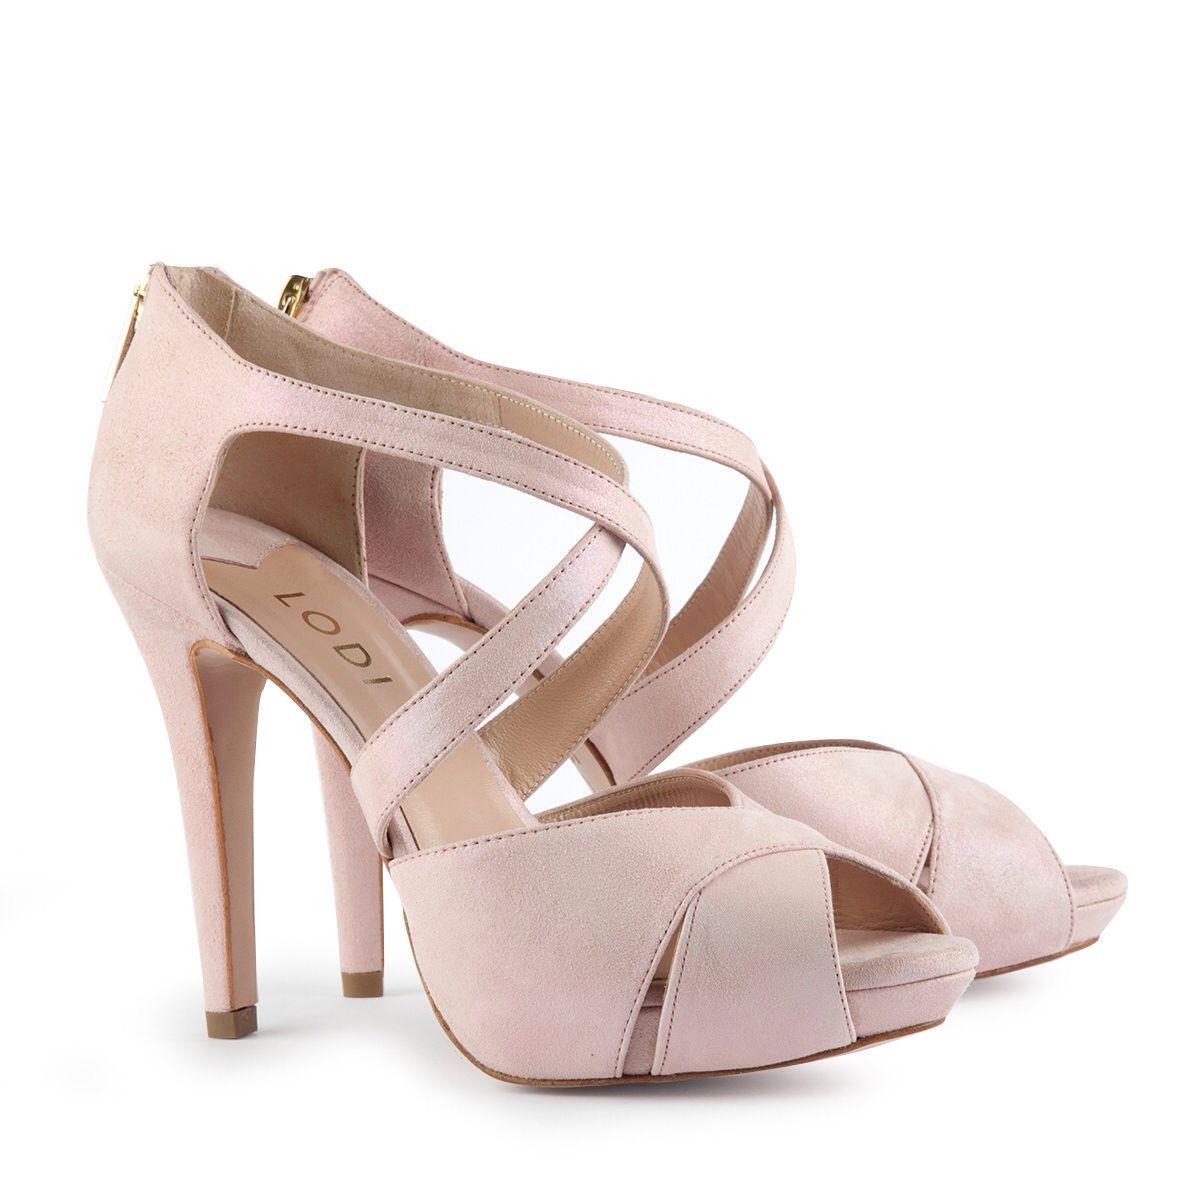 Sandalias de tacón de mujer Lodi en ante de color rosa MLZ8ZP6Wwj